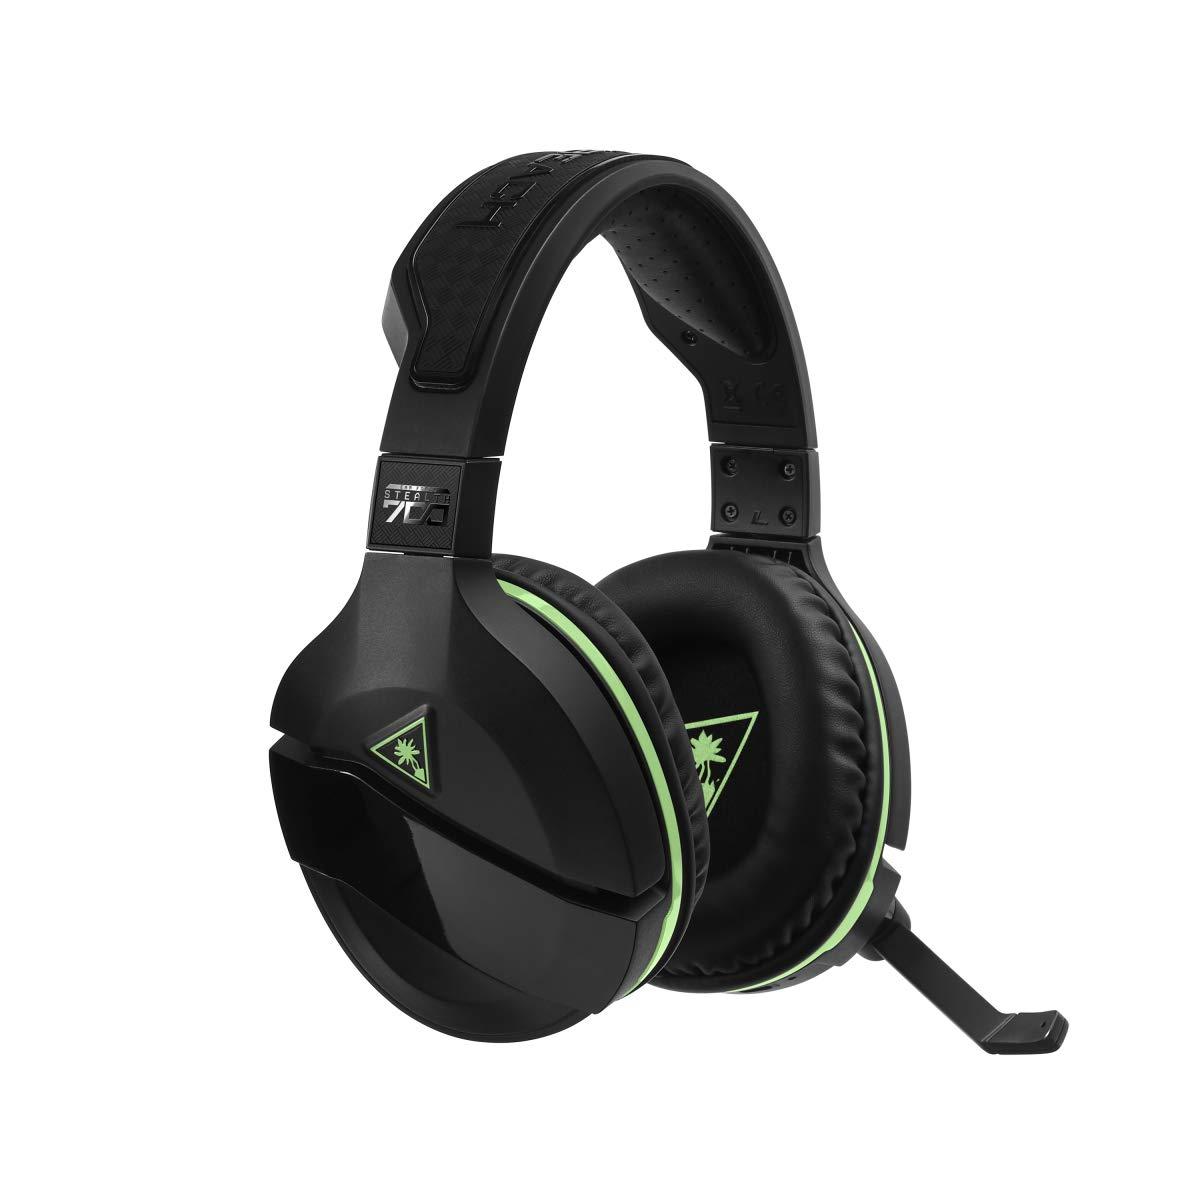 Turtle Beach Stealth 700 Premium Wireless Surround Sound Gaming Headset - Xbox One by Turtle Beach